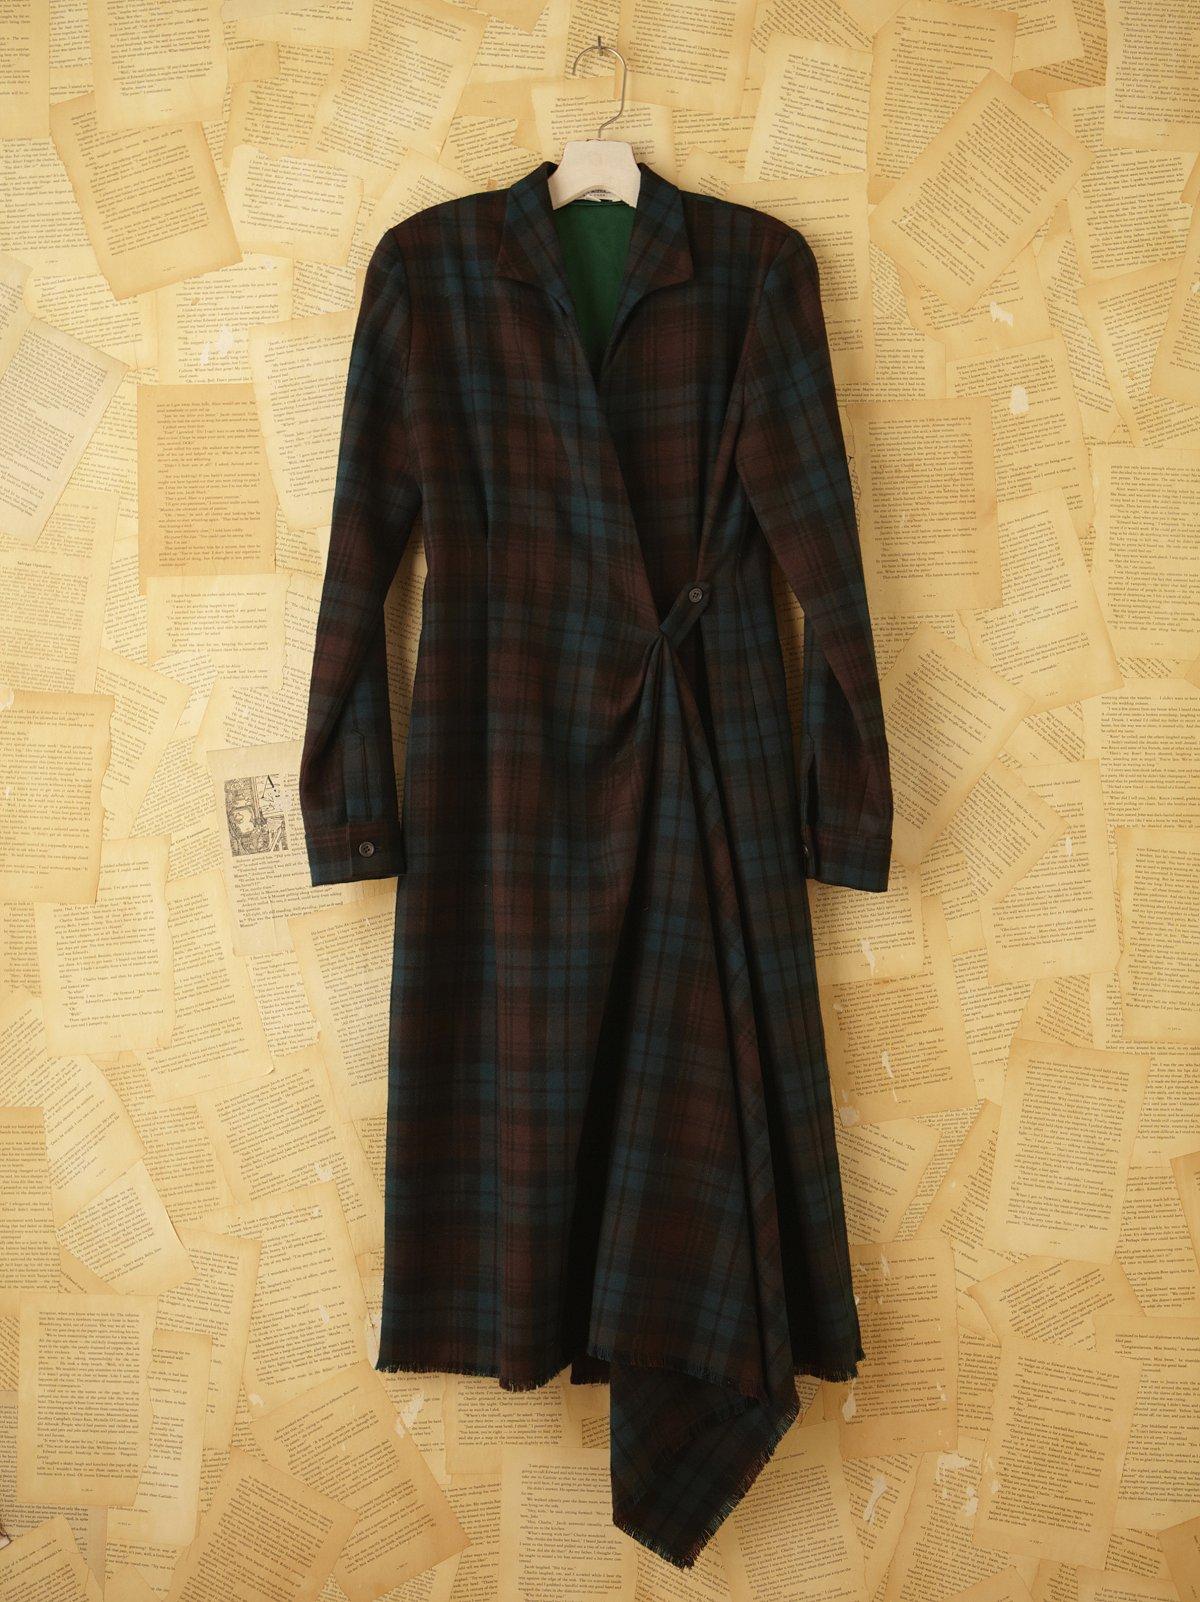 Vintage Isaac Mizrahi Coat